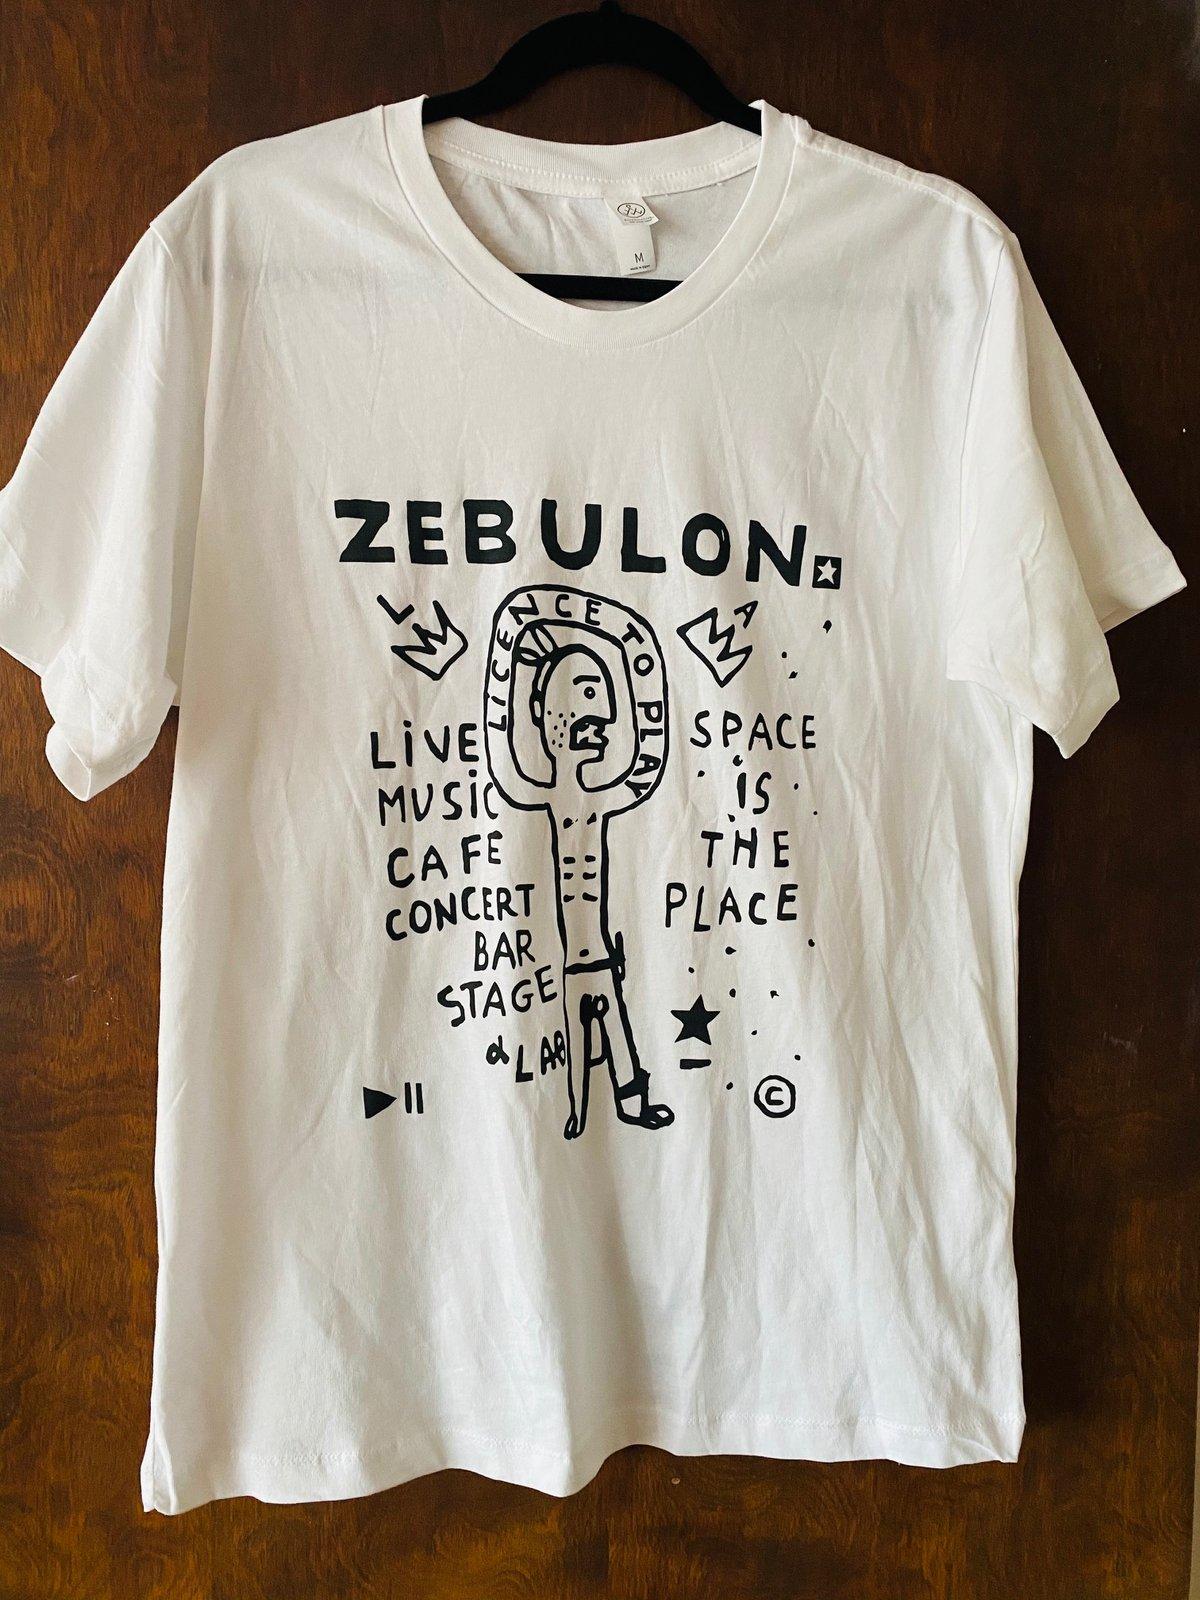 Zebulon T-Shirt!!!